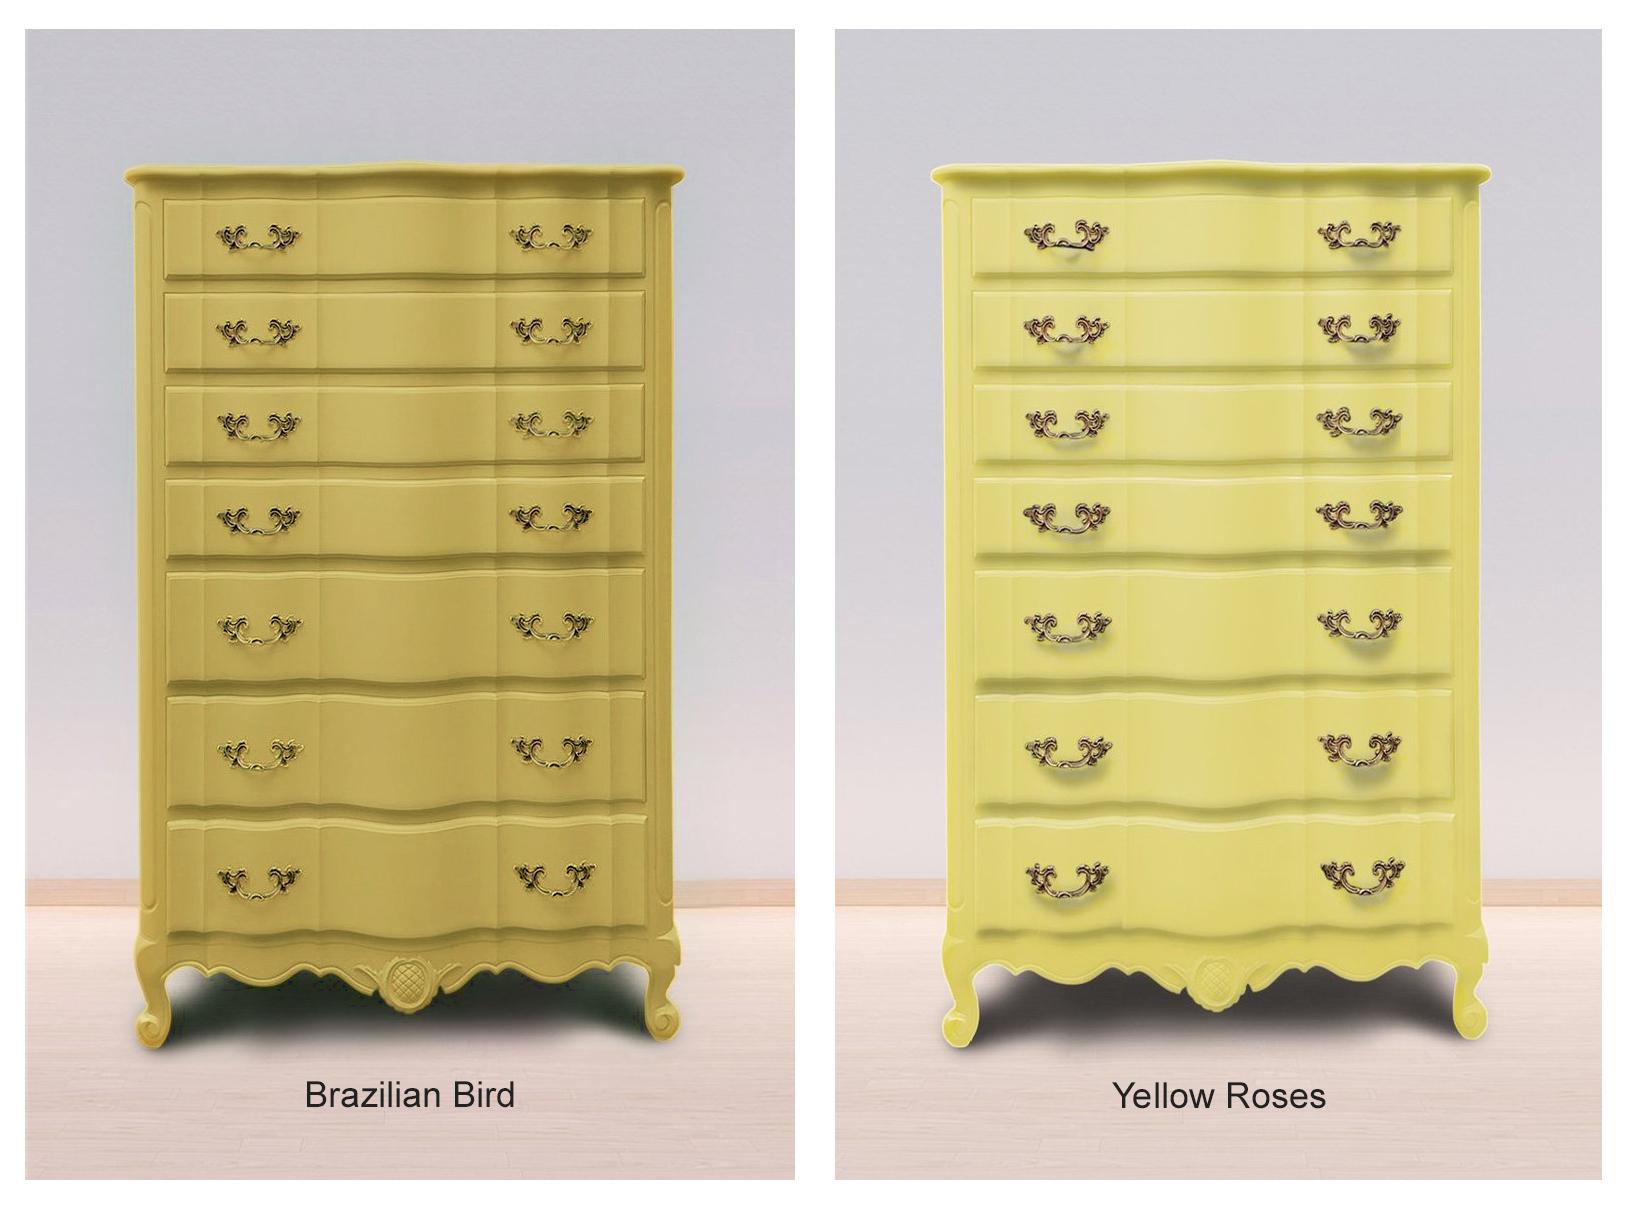 Brazilian Bird & Yellow Roses